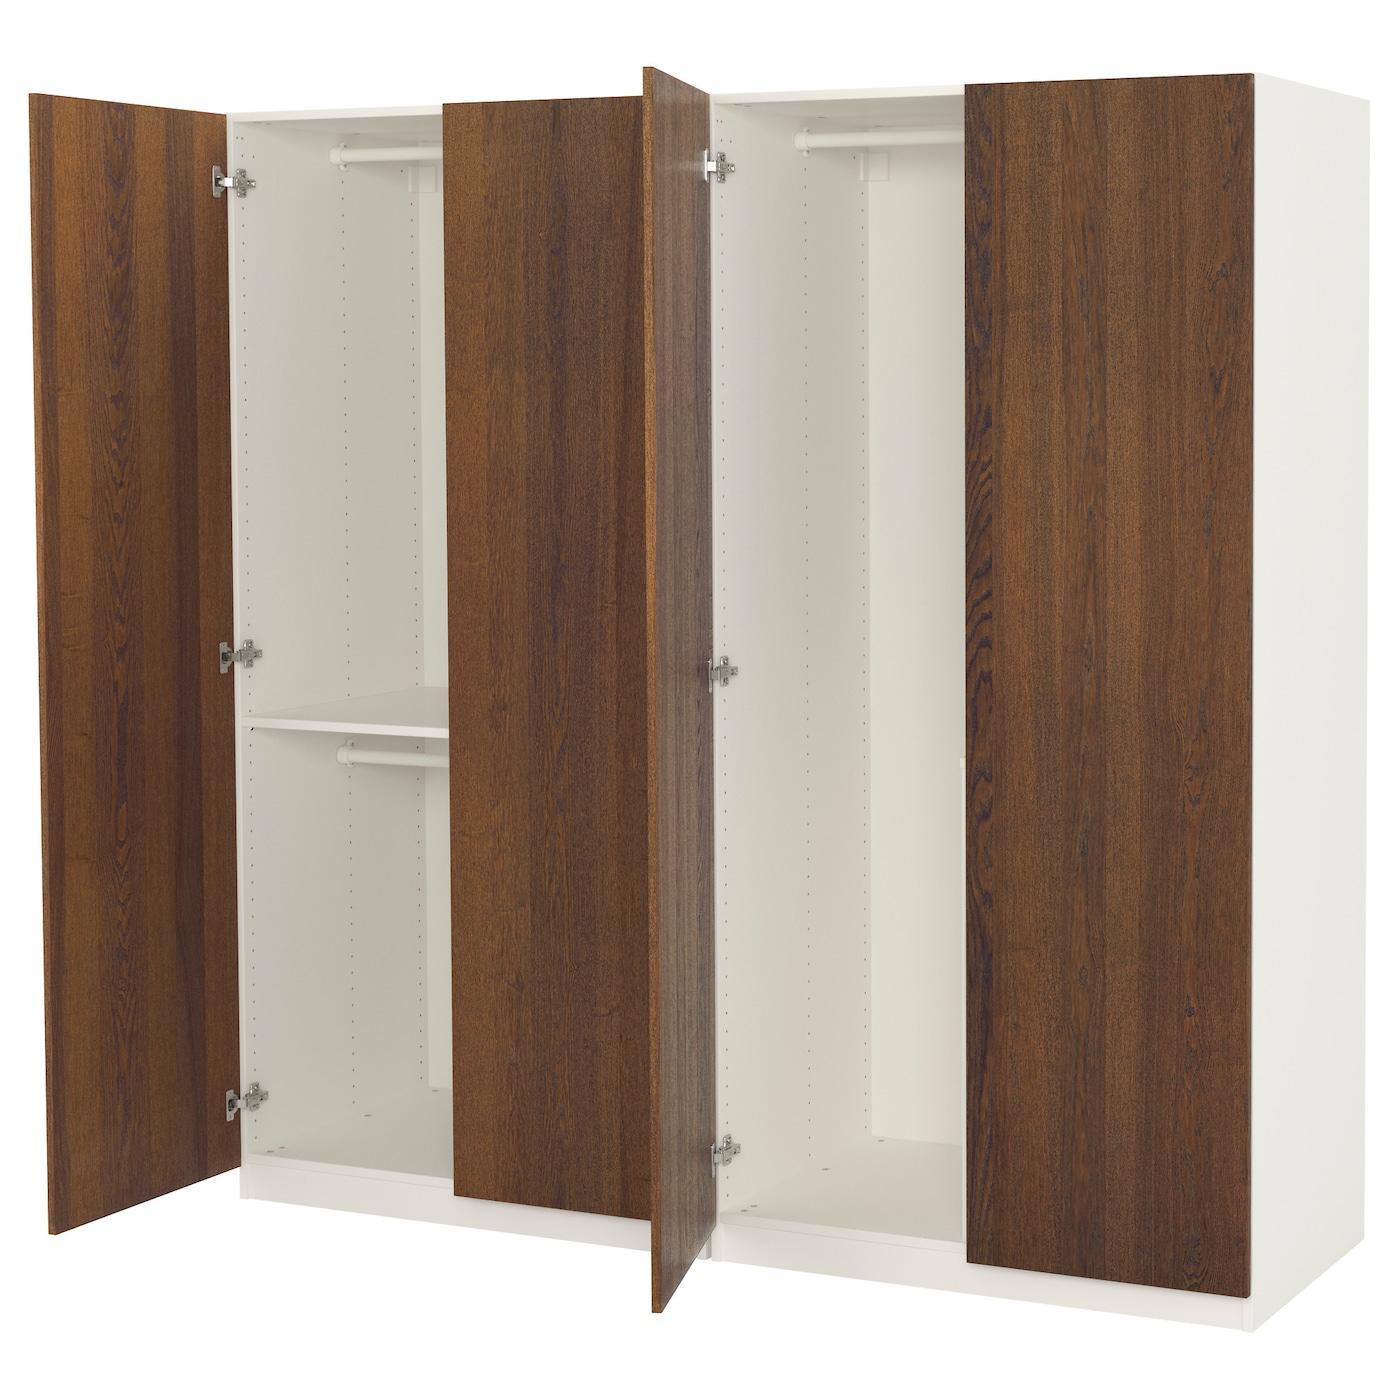 pax wardrobe white nexus brown stained ash veneer 200x60x201 cm ikea. Black Bedroom Furniture Sets. Home Design Ideas